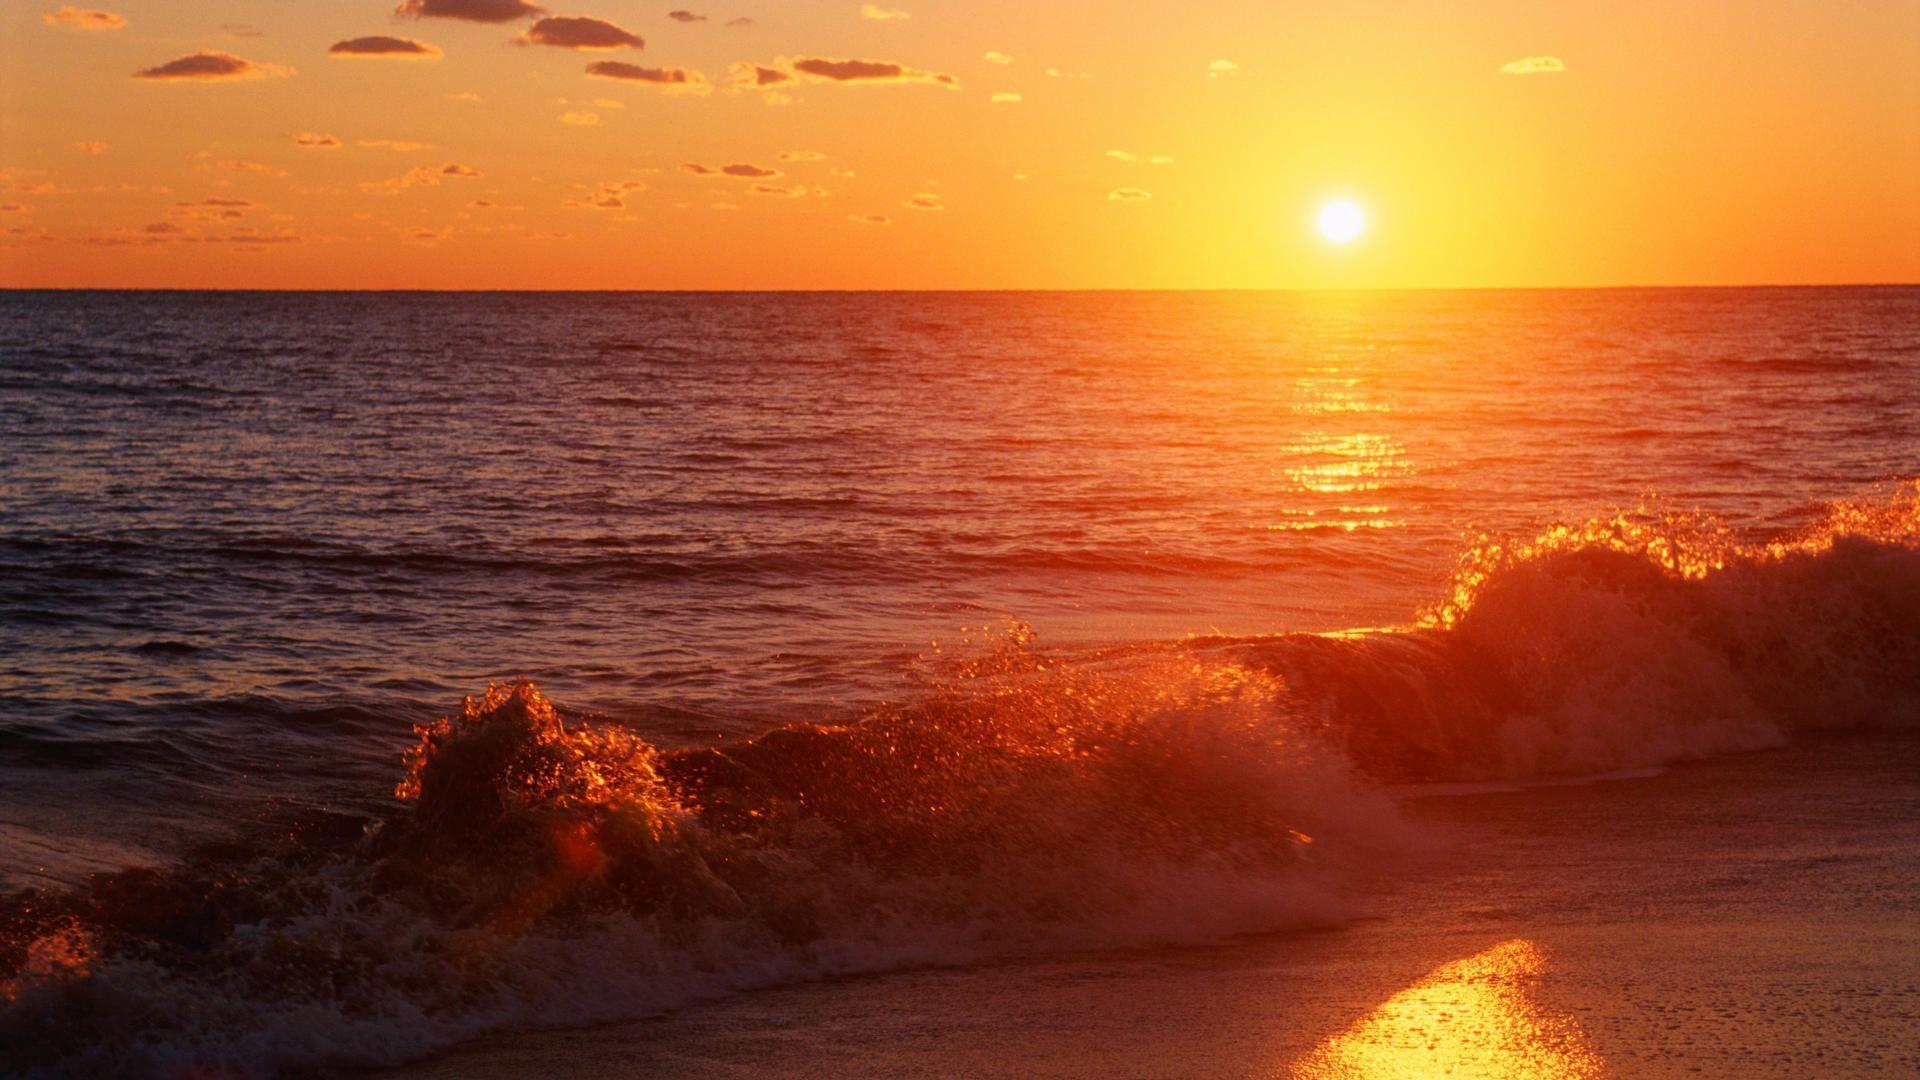 43 California Sunset Wallpaper On Wallpapersafari Wallpaper hills sunset sky sea golden